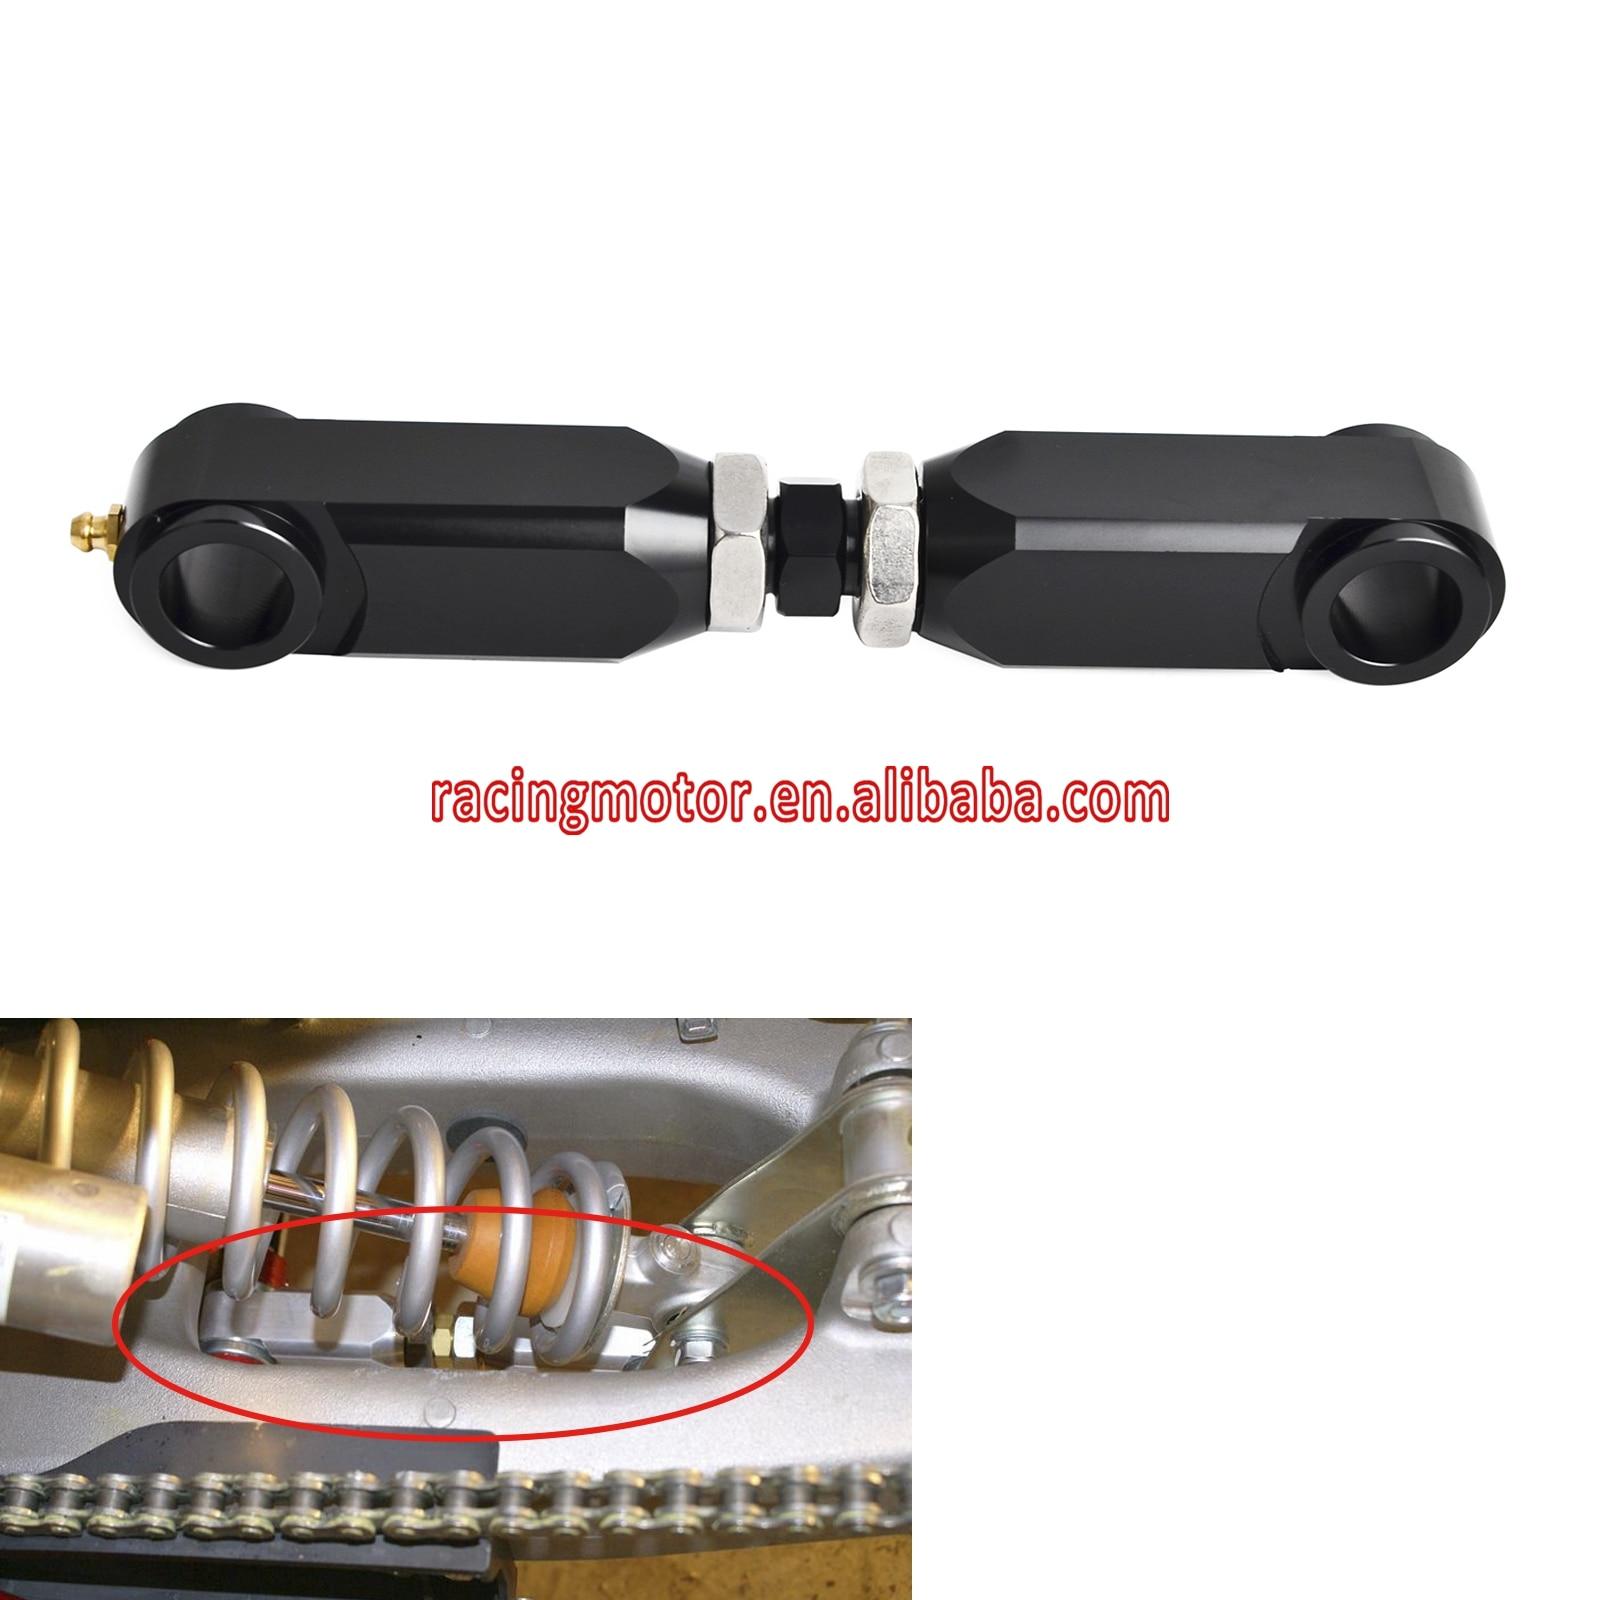 Adjustable Rear Lowering Kit Arm Relay Connecting Rod For Yamaha Raptor 350 660 600R 700 YFM350 04-13 YFM660R 01-05 YFM700 06-17 for yamaha rear brake caliper assembly banshee warrior blaster raptor 350 yfm350